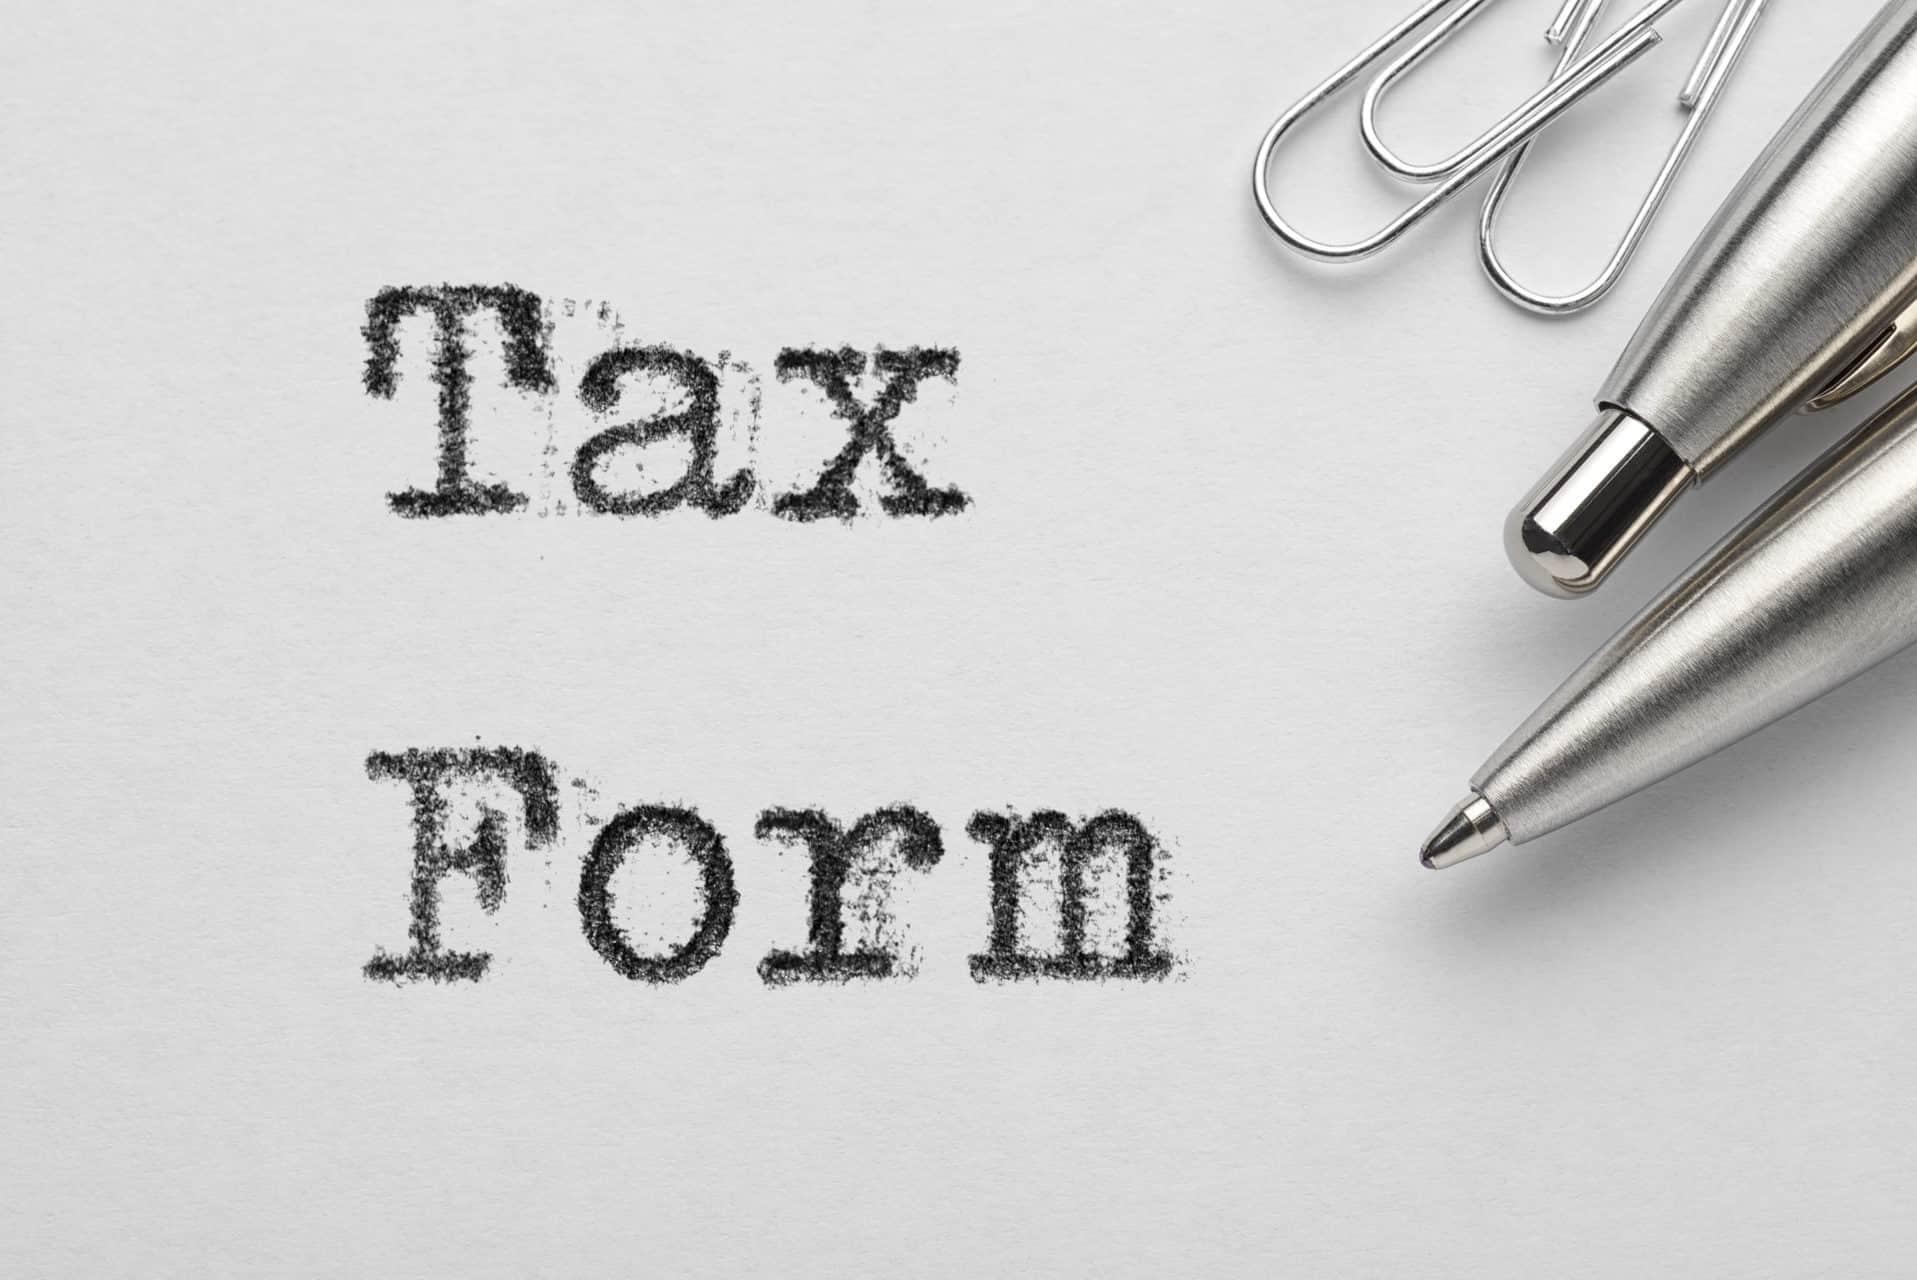 Key Dates For The 2020-2021 Tax Year | Tax Return Deadline pertaining to Hmrc Tax Calendar 2021 2021 Template